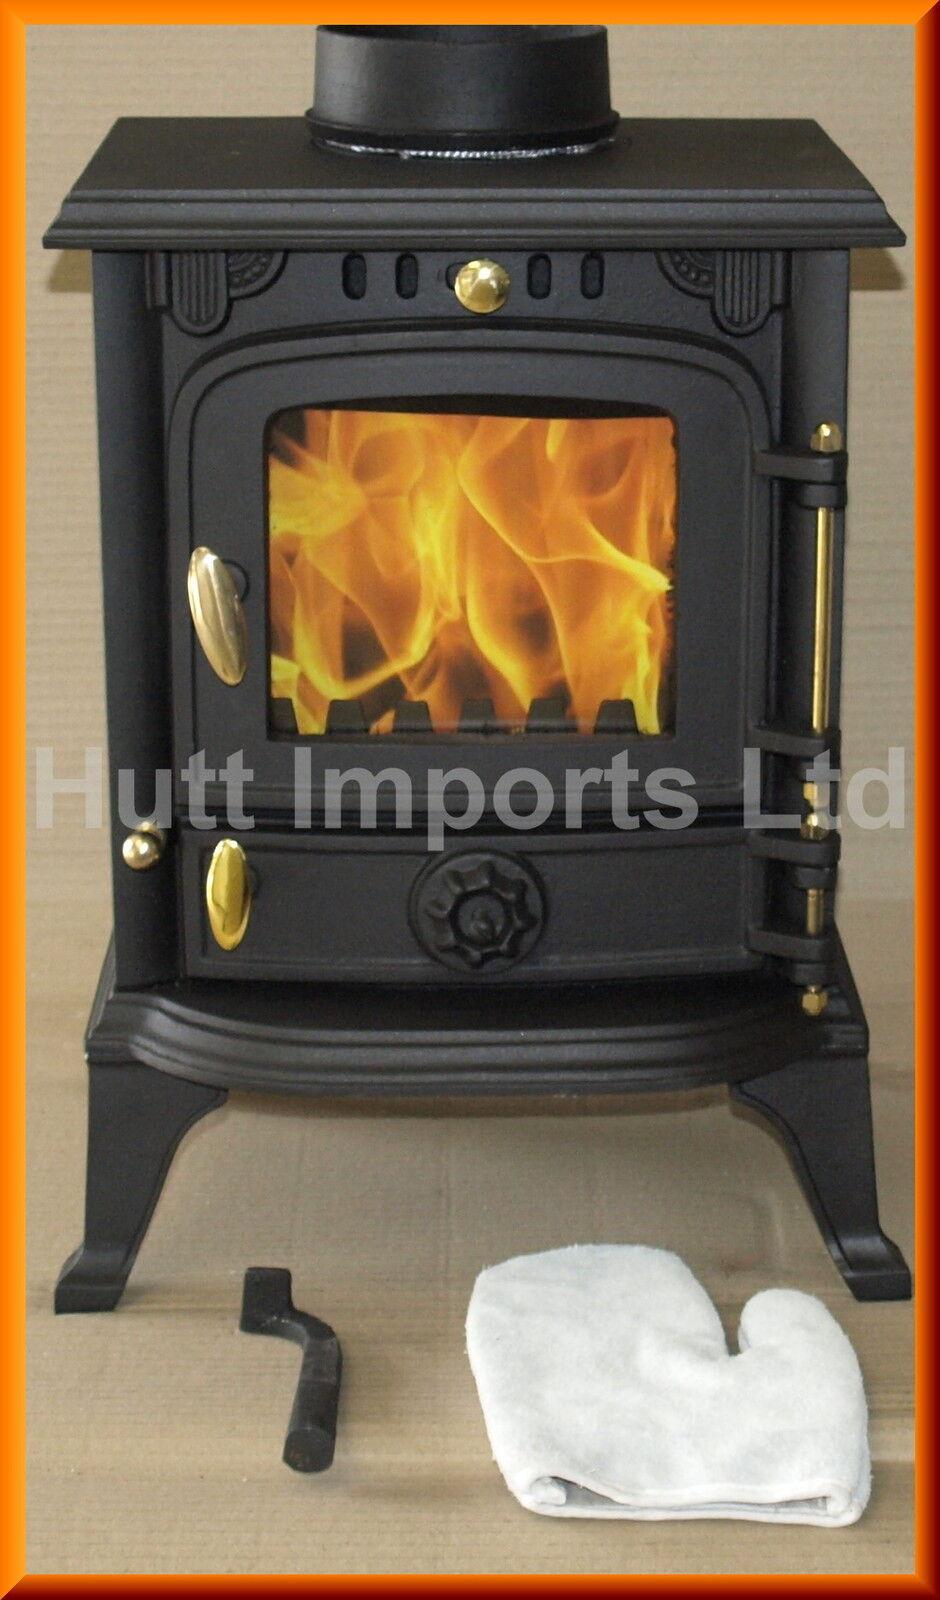 Cast Iron wood burning, Multi fuel stove fire 4.5Kw New HI013s JA013s CE 5kw 6kw